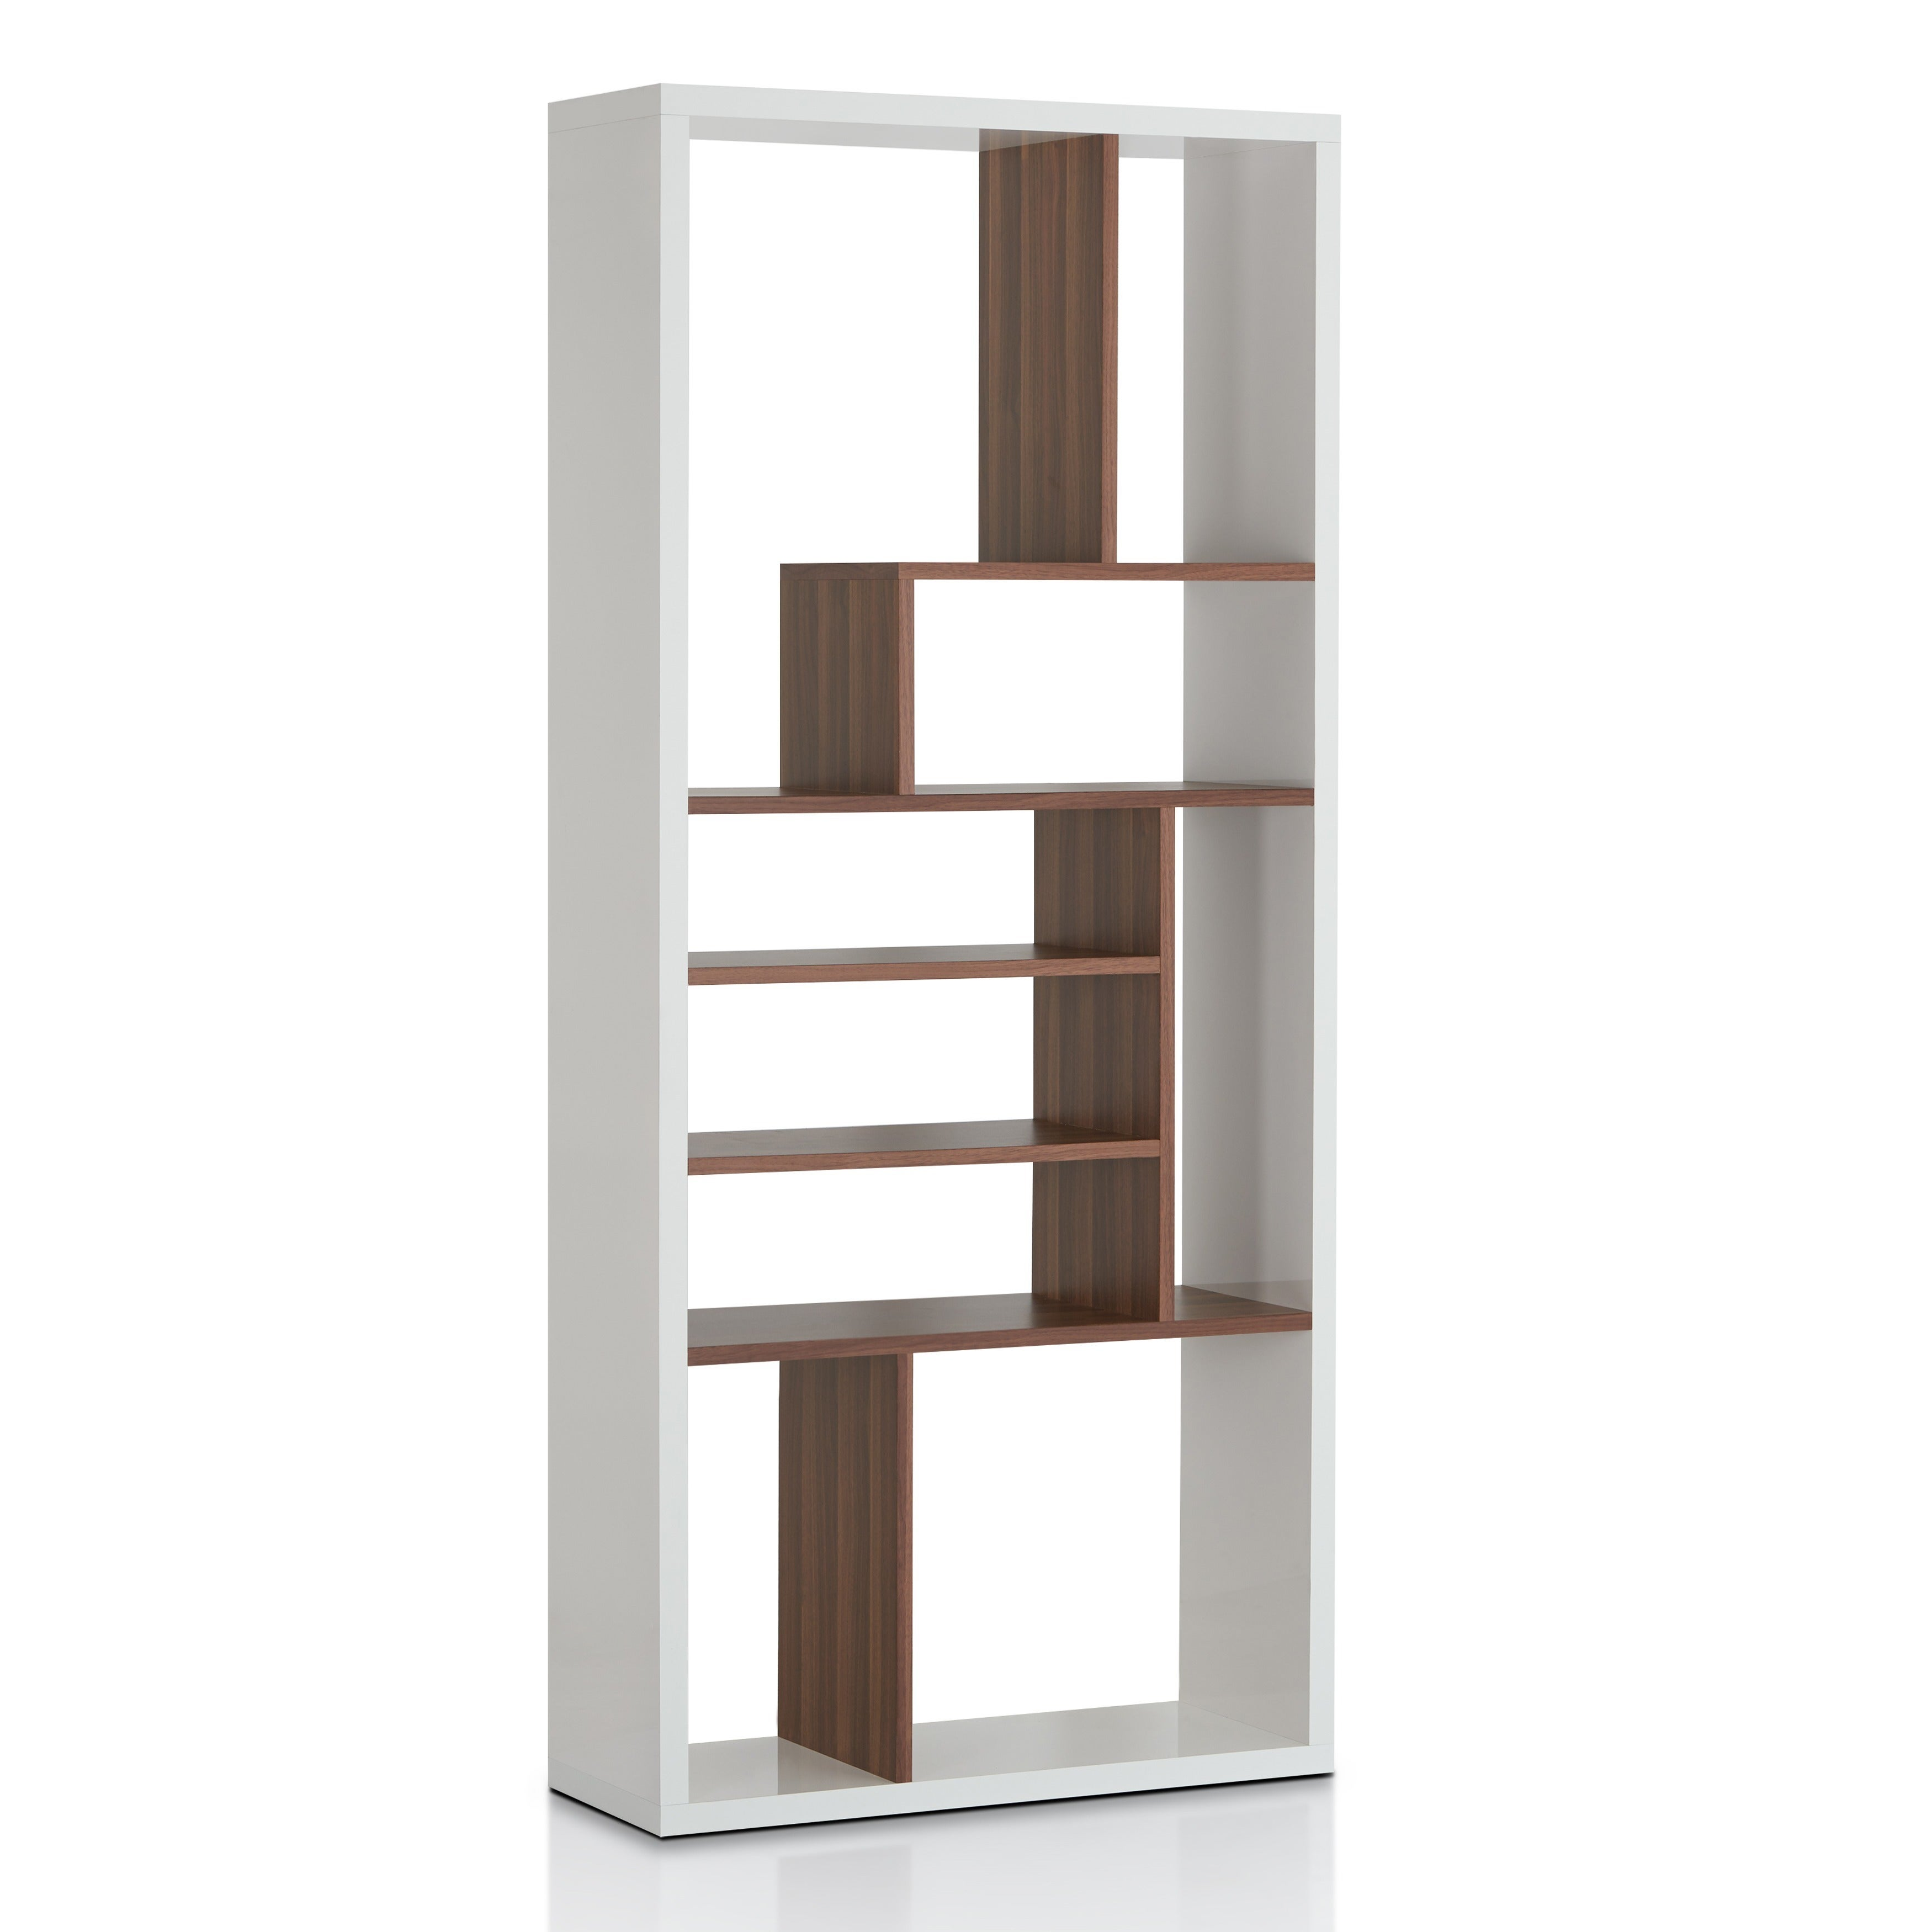 Furniture of America Bart Multi-tiered Modern Display Bookshelf - Free  Shipping Today - Overstock.com - 13133604